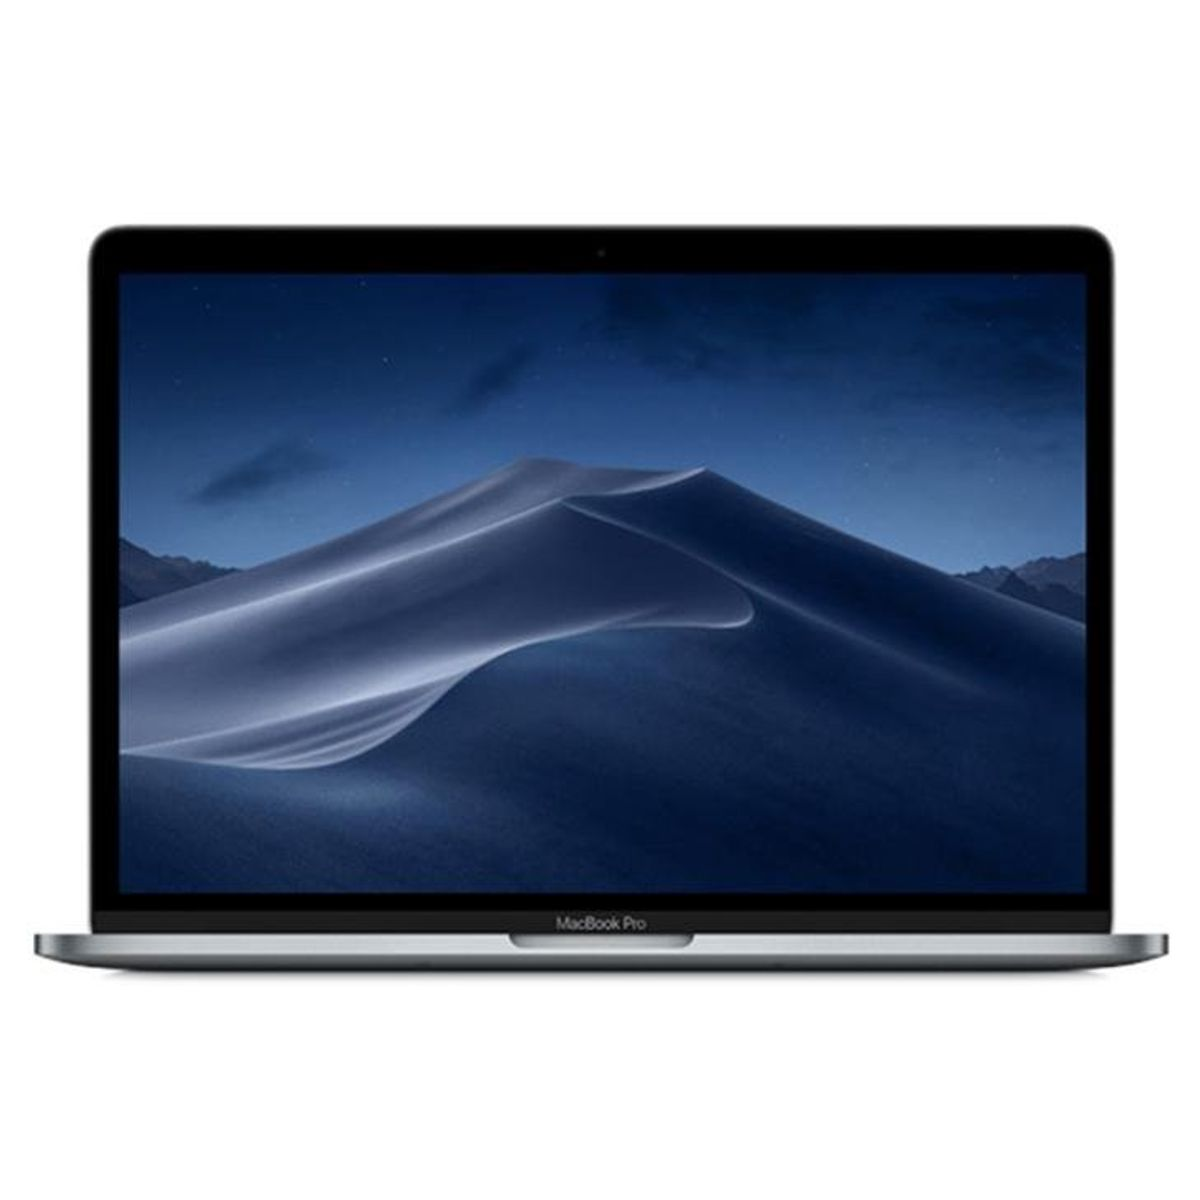 "Macbook - Apple Mv962bz/a I5 2.40ghz 8gb 256gb Ssd Intel Iris Plus Graphics 655 Macos Retina 13,3"" Polegadas"